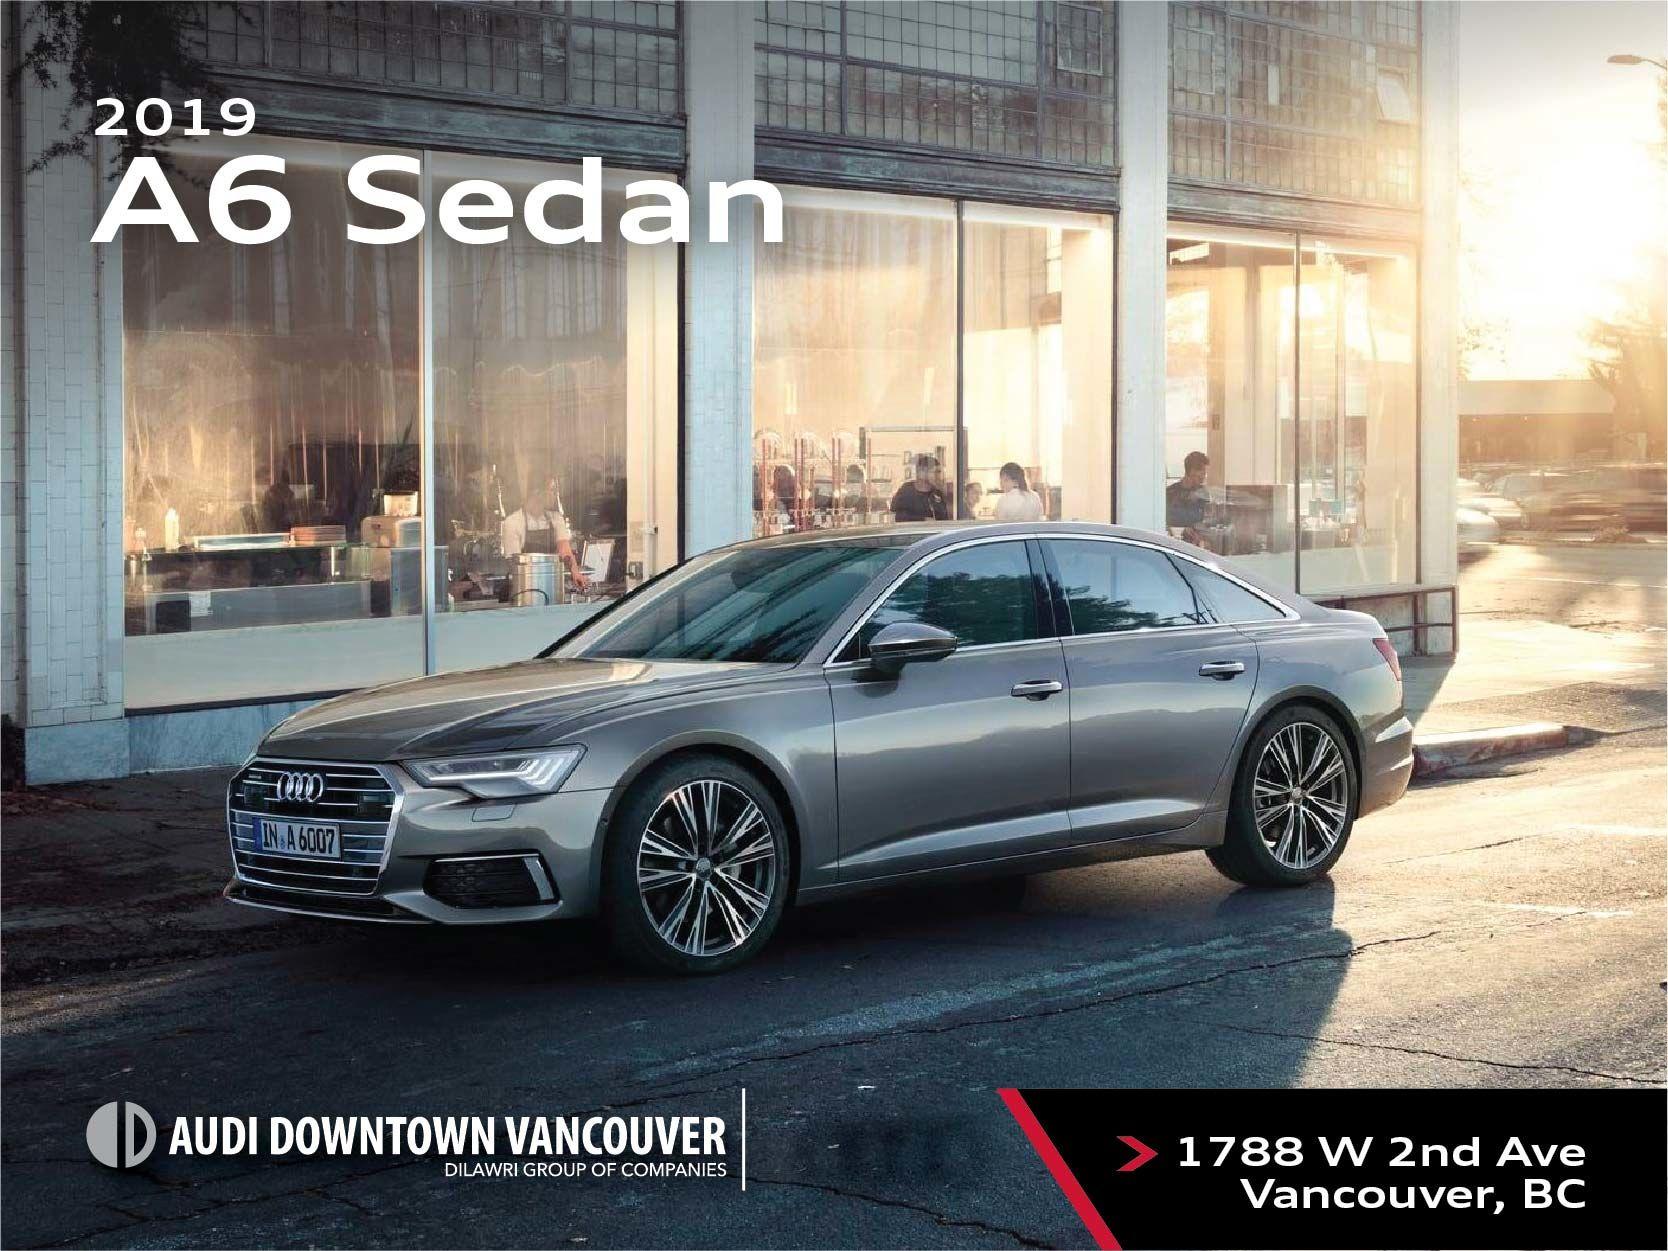 The 2019 Audi A6 Sedan